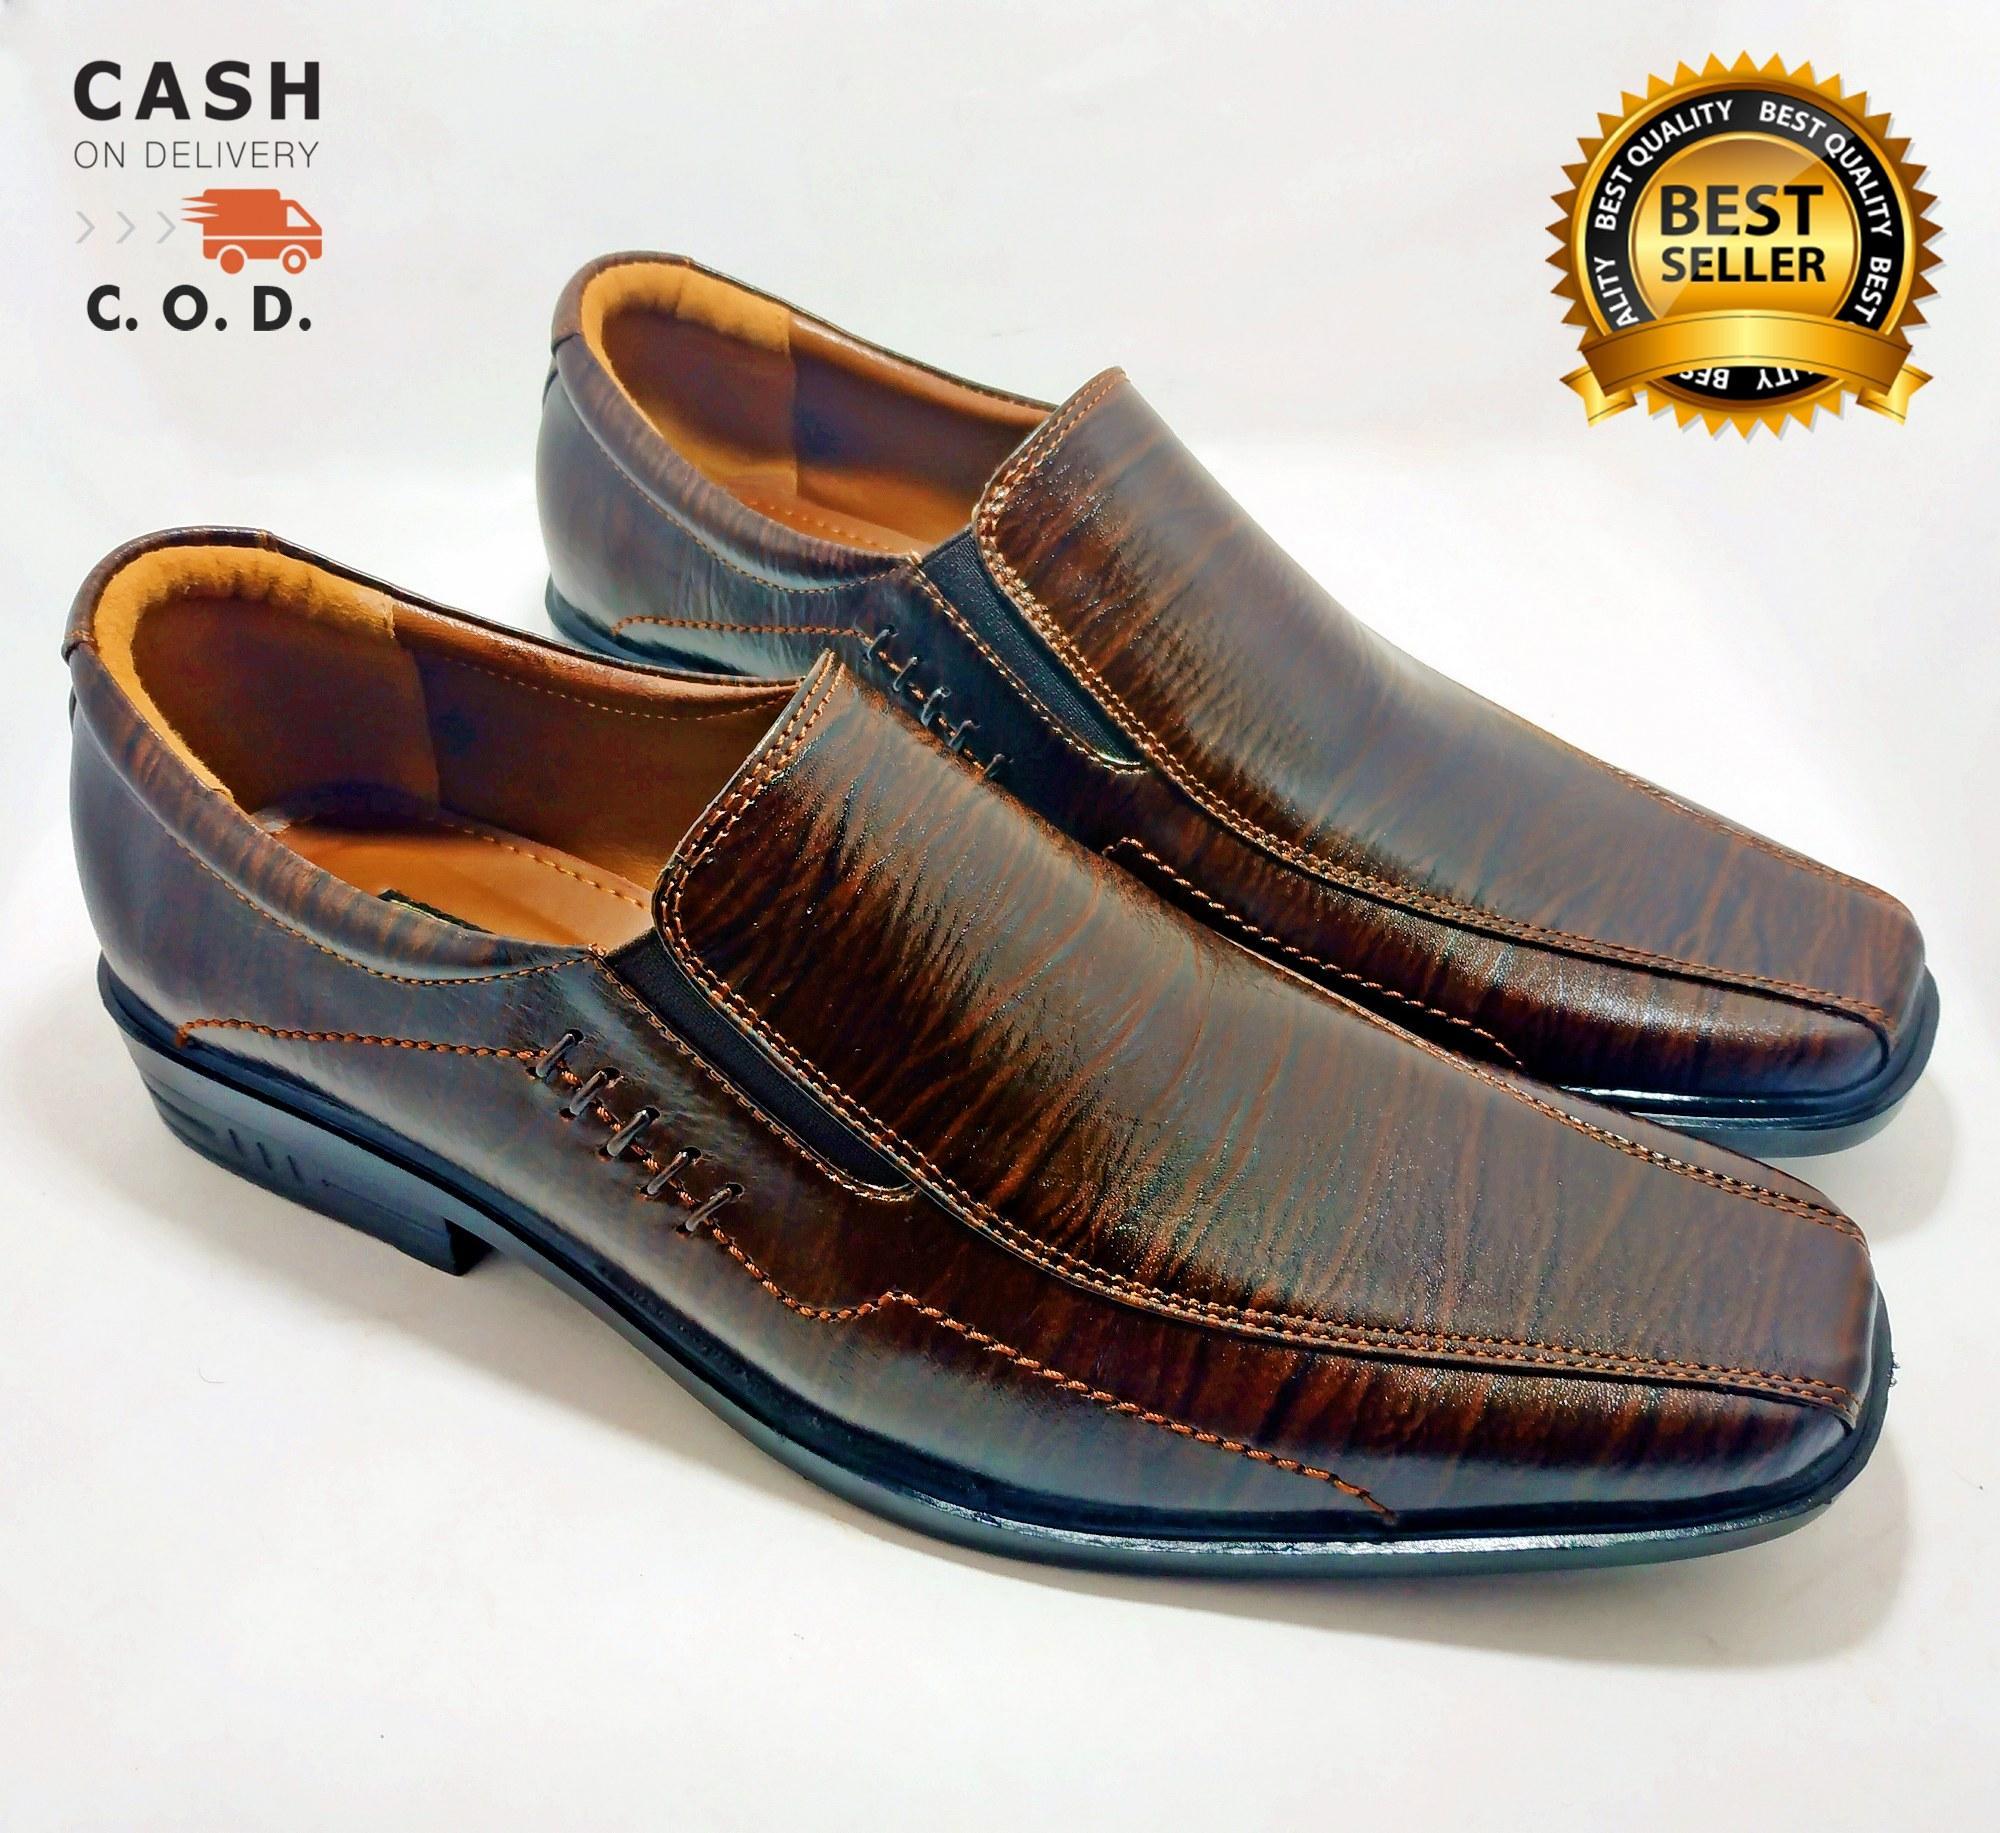 Sepatu Kantor Pria Kulit Asli 100% Bukan Sintetis Tekstur Serat Kayu  Pantofel Big Size Ukuran 97c11349fc